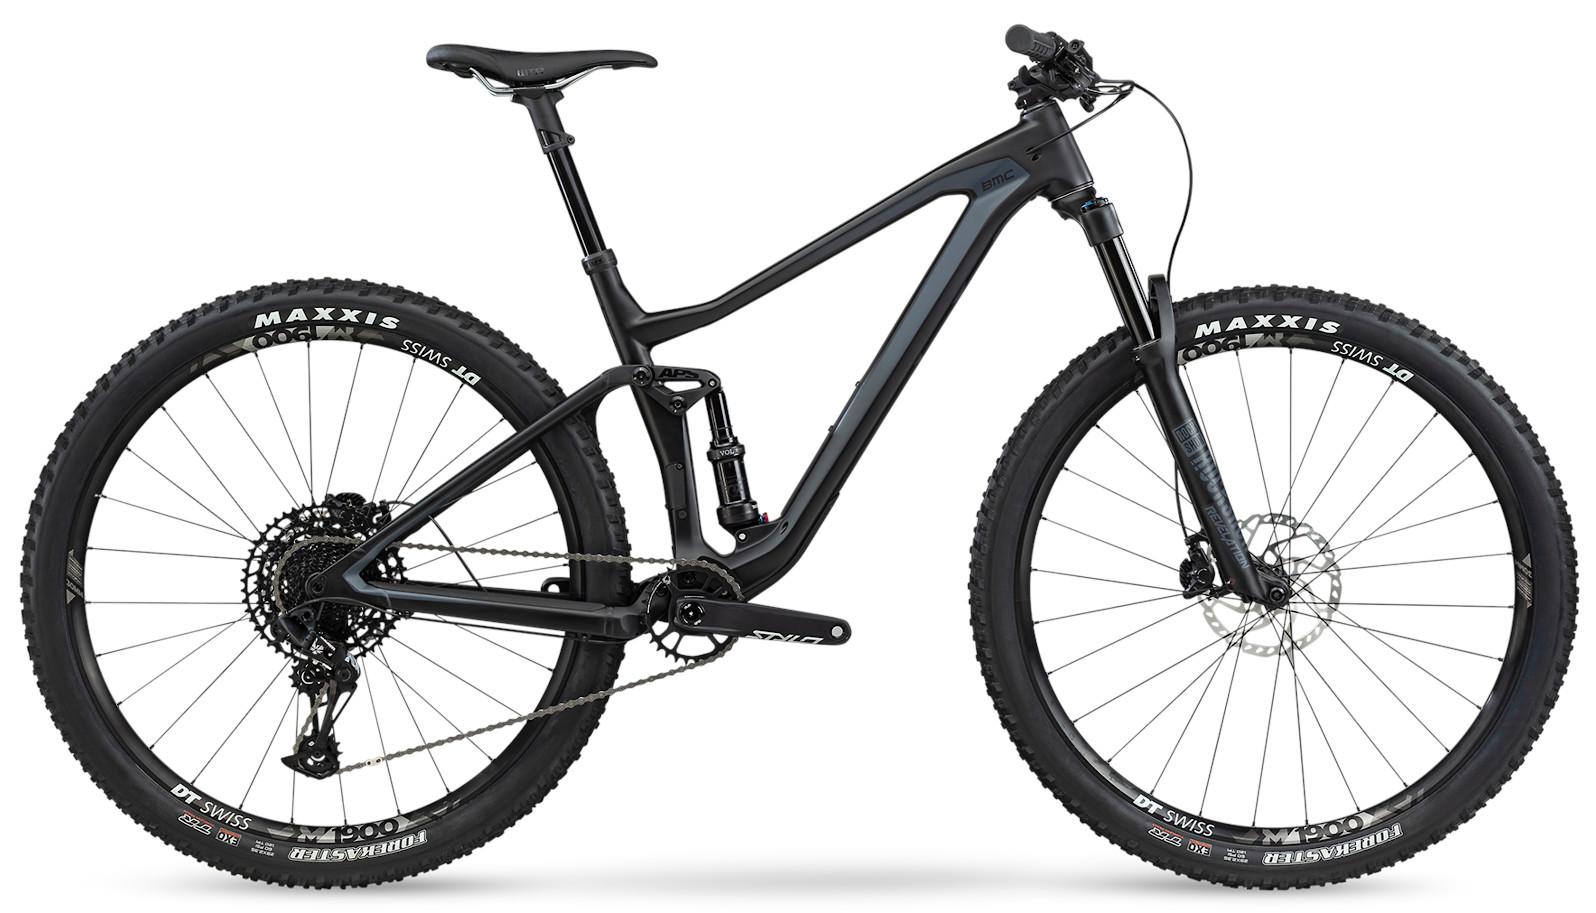 2020 BMC Speedfox 02 Two